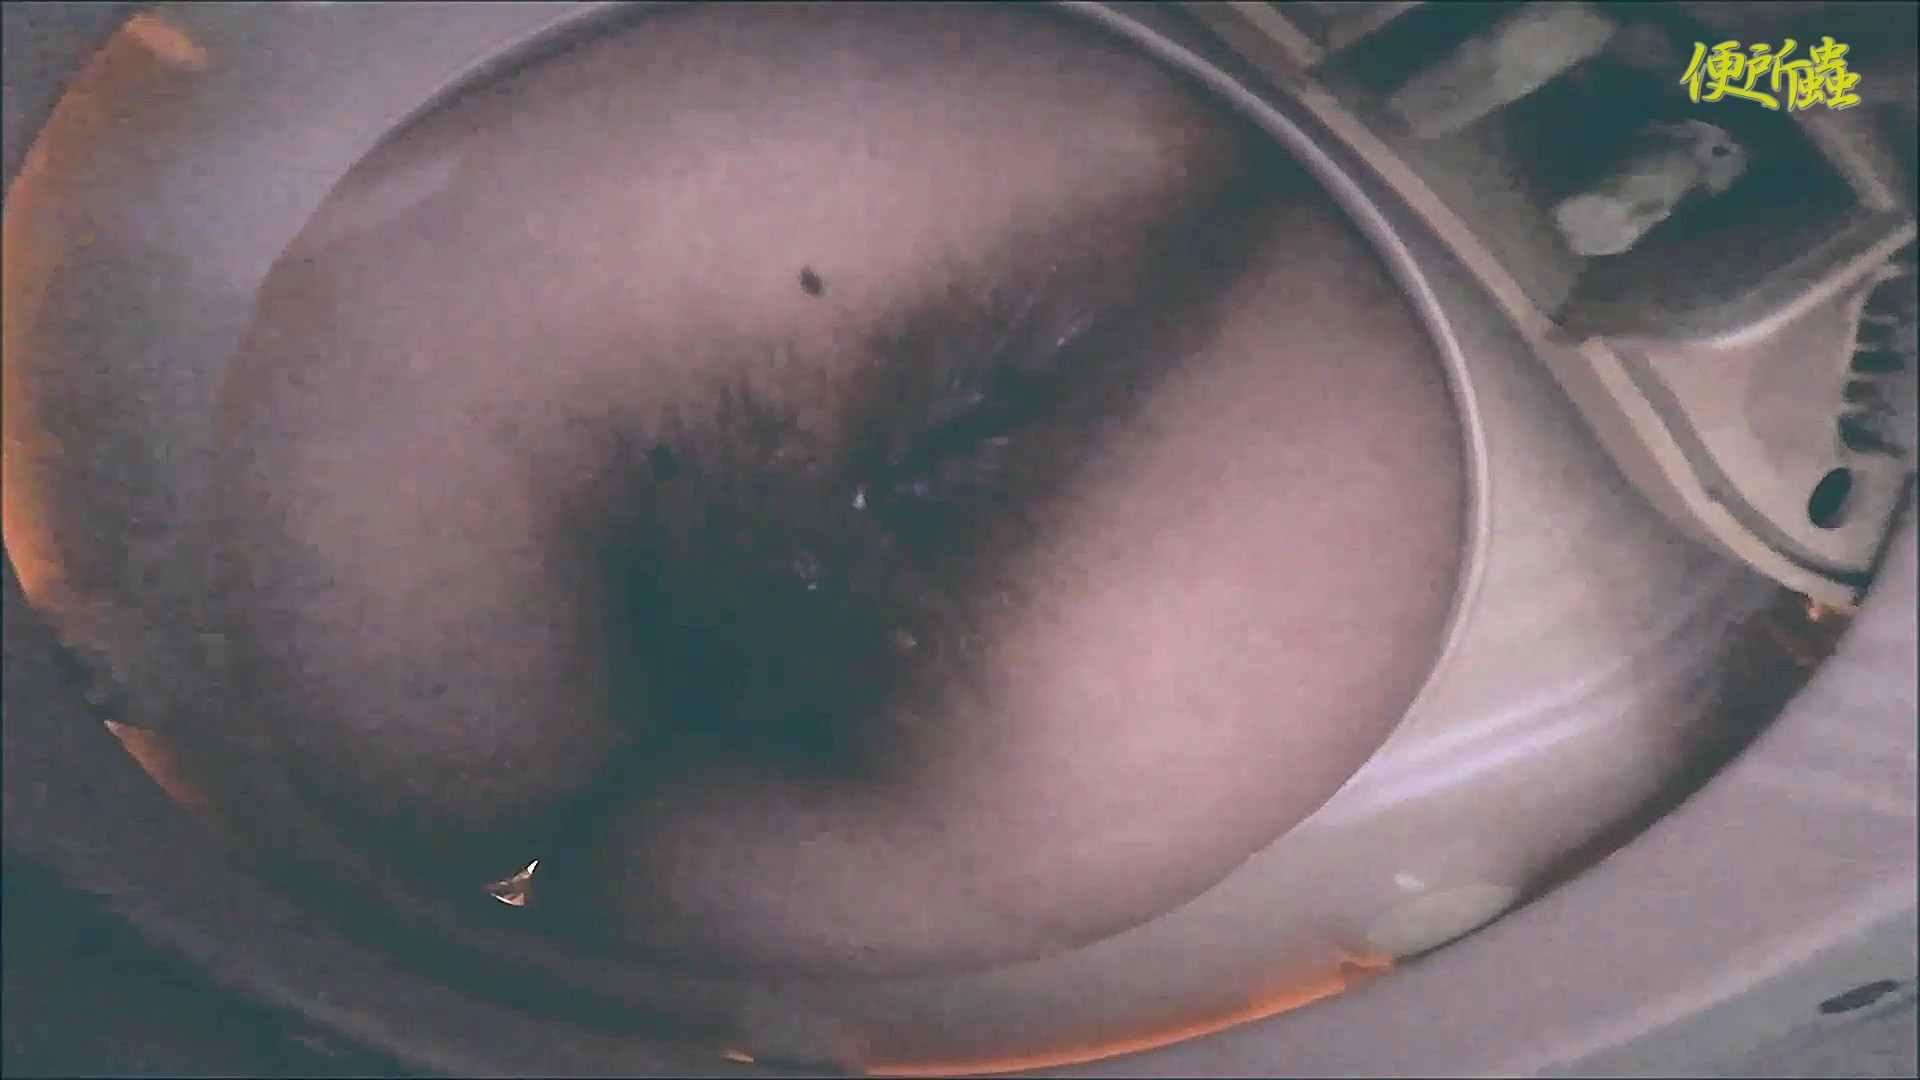 vol.12 便所蟲さんのリターン~寺子屋洗面所盗撮~ 便器 盗撮ヌード画像 99pic 4